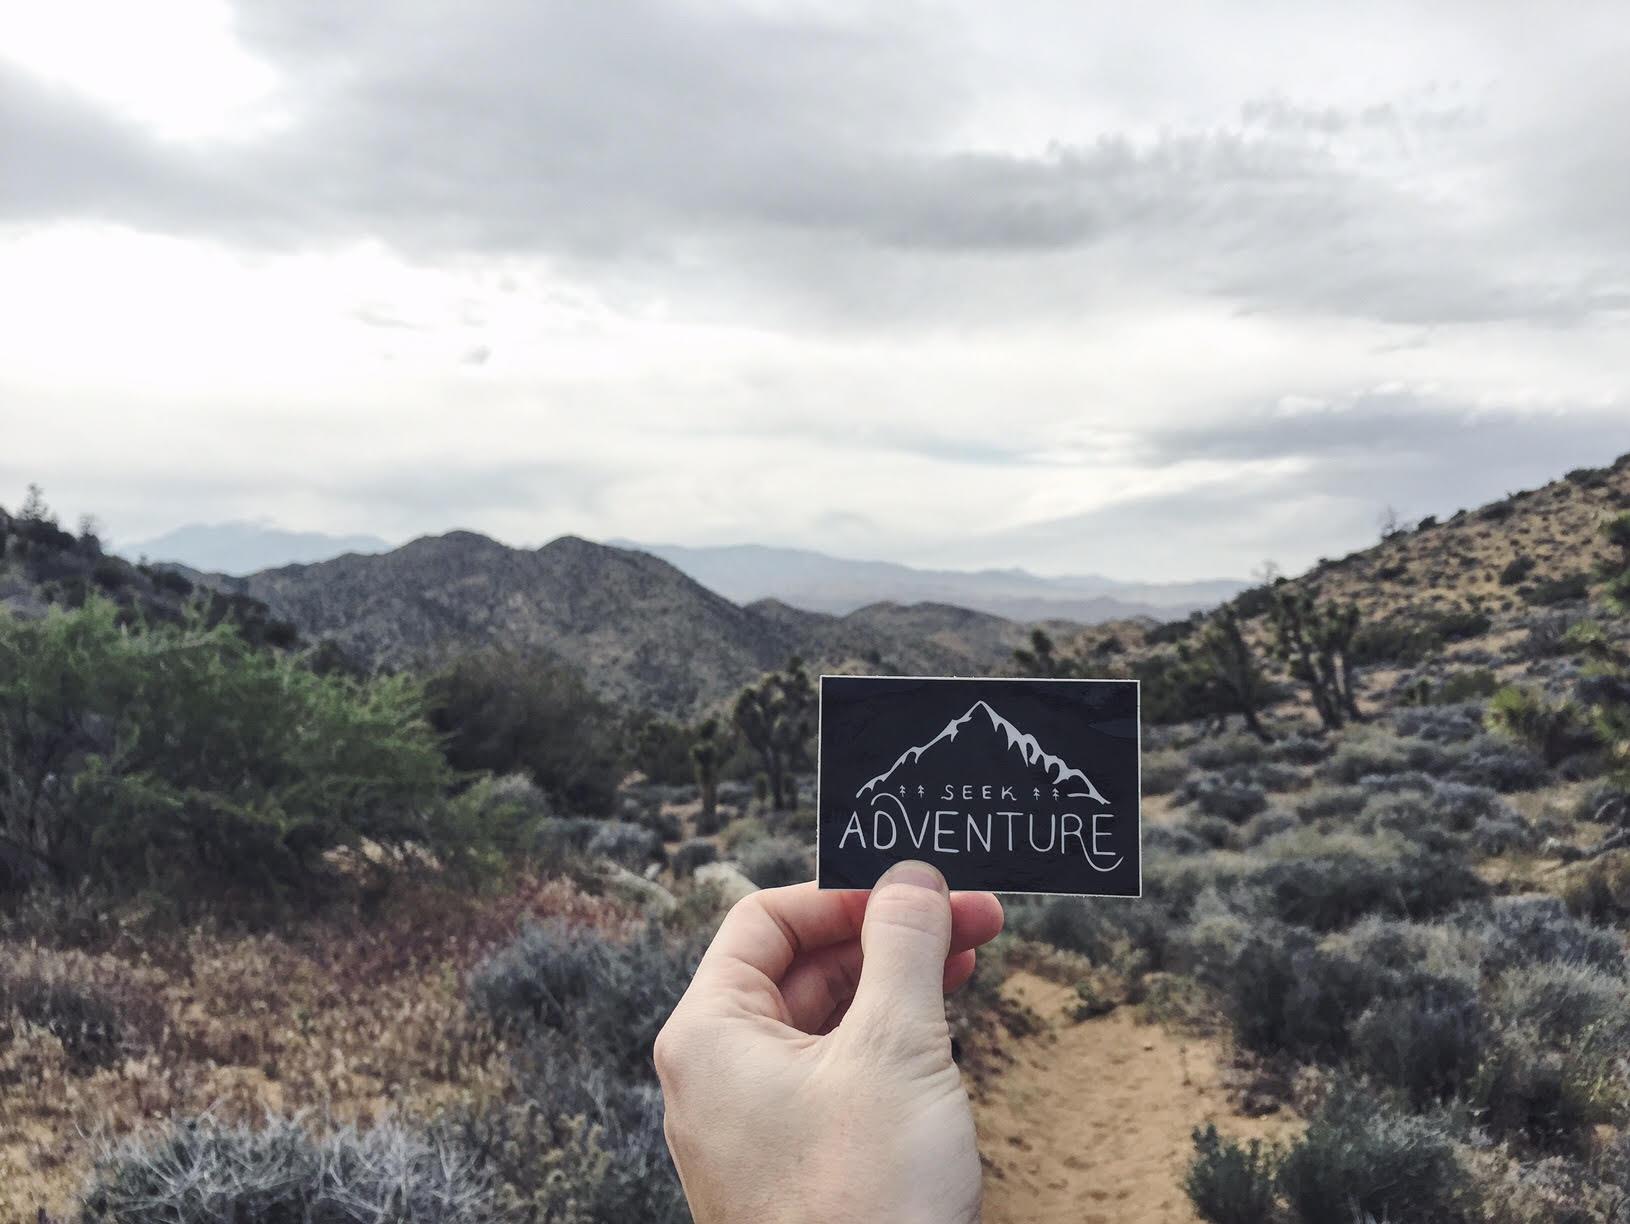 "My ""Seek Adventure"" sticker in Joshua Tree National Park - get yours  here!"